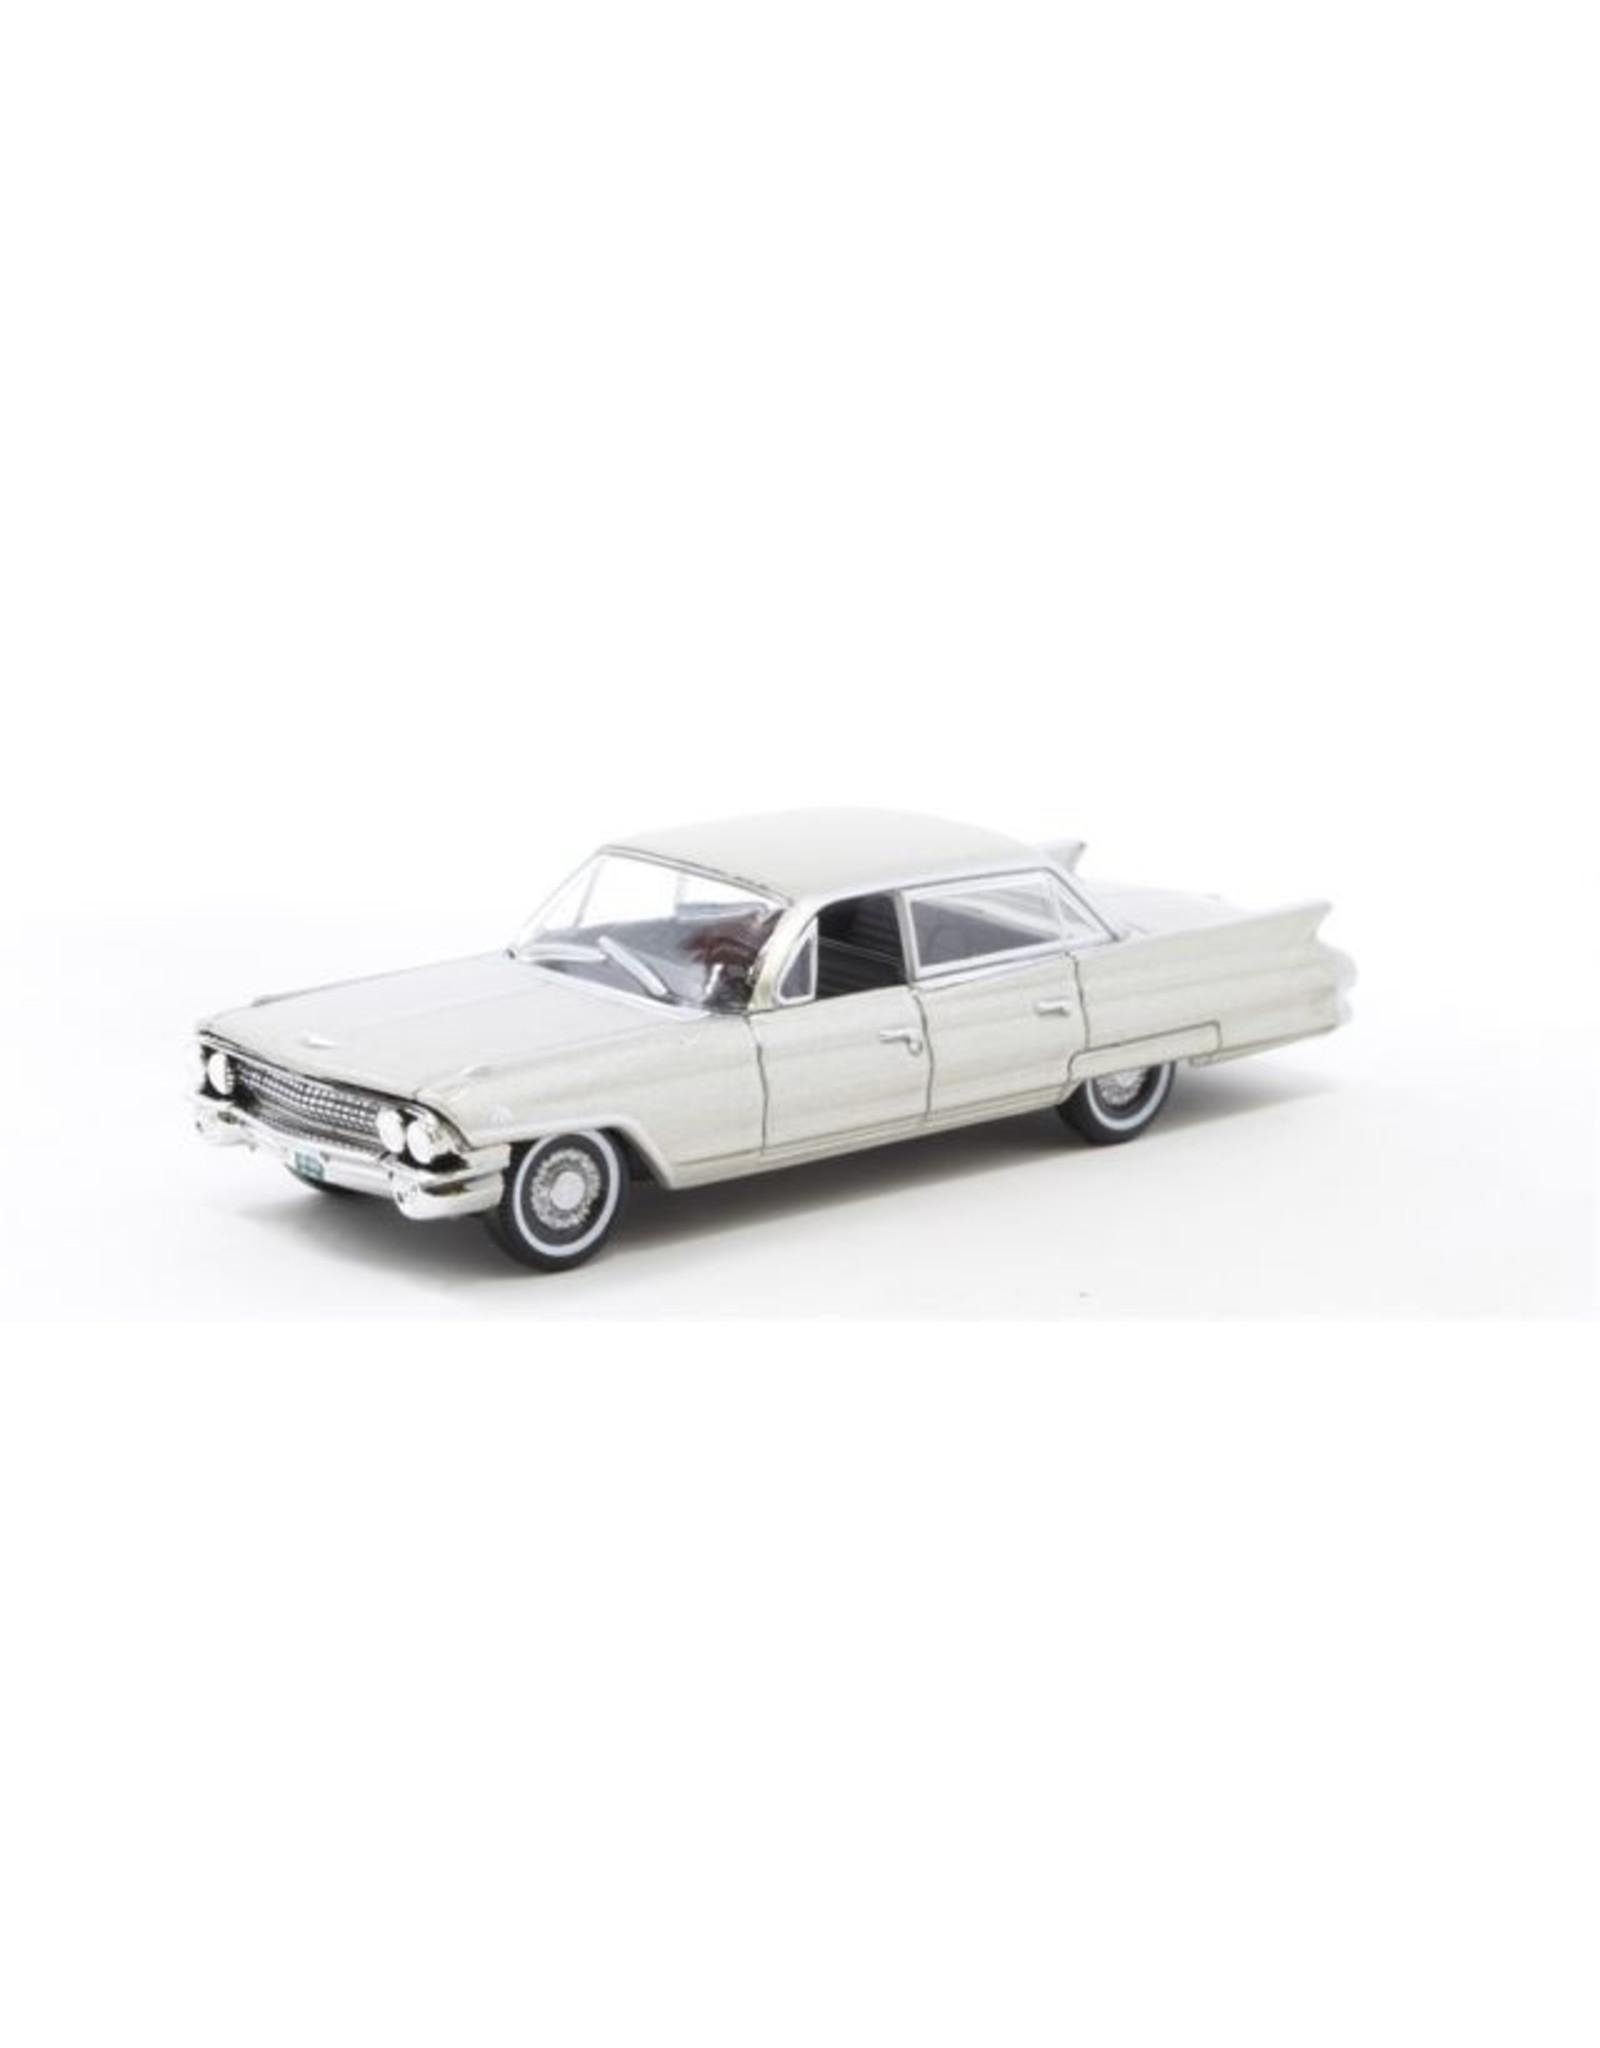 Cadillac CADILLAC SEDAN DEVILLE 1961(Aspen gold metallic)